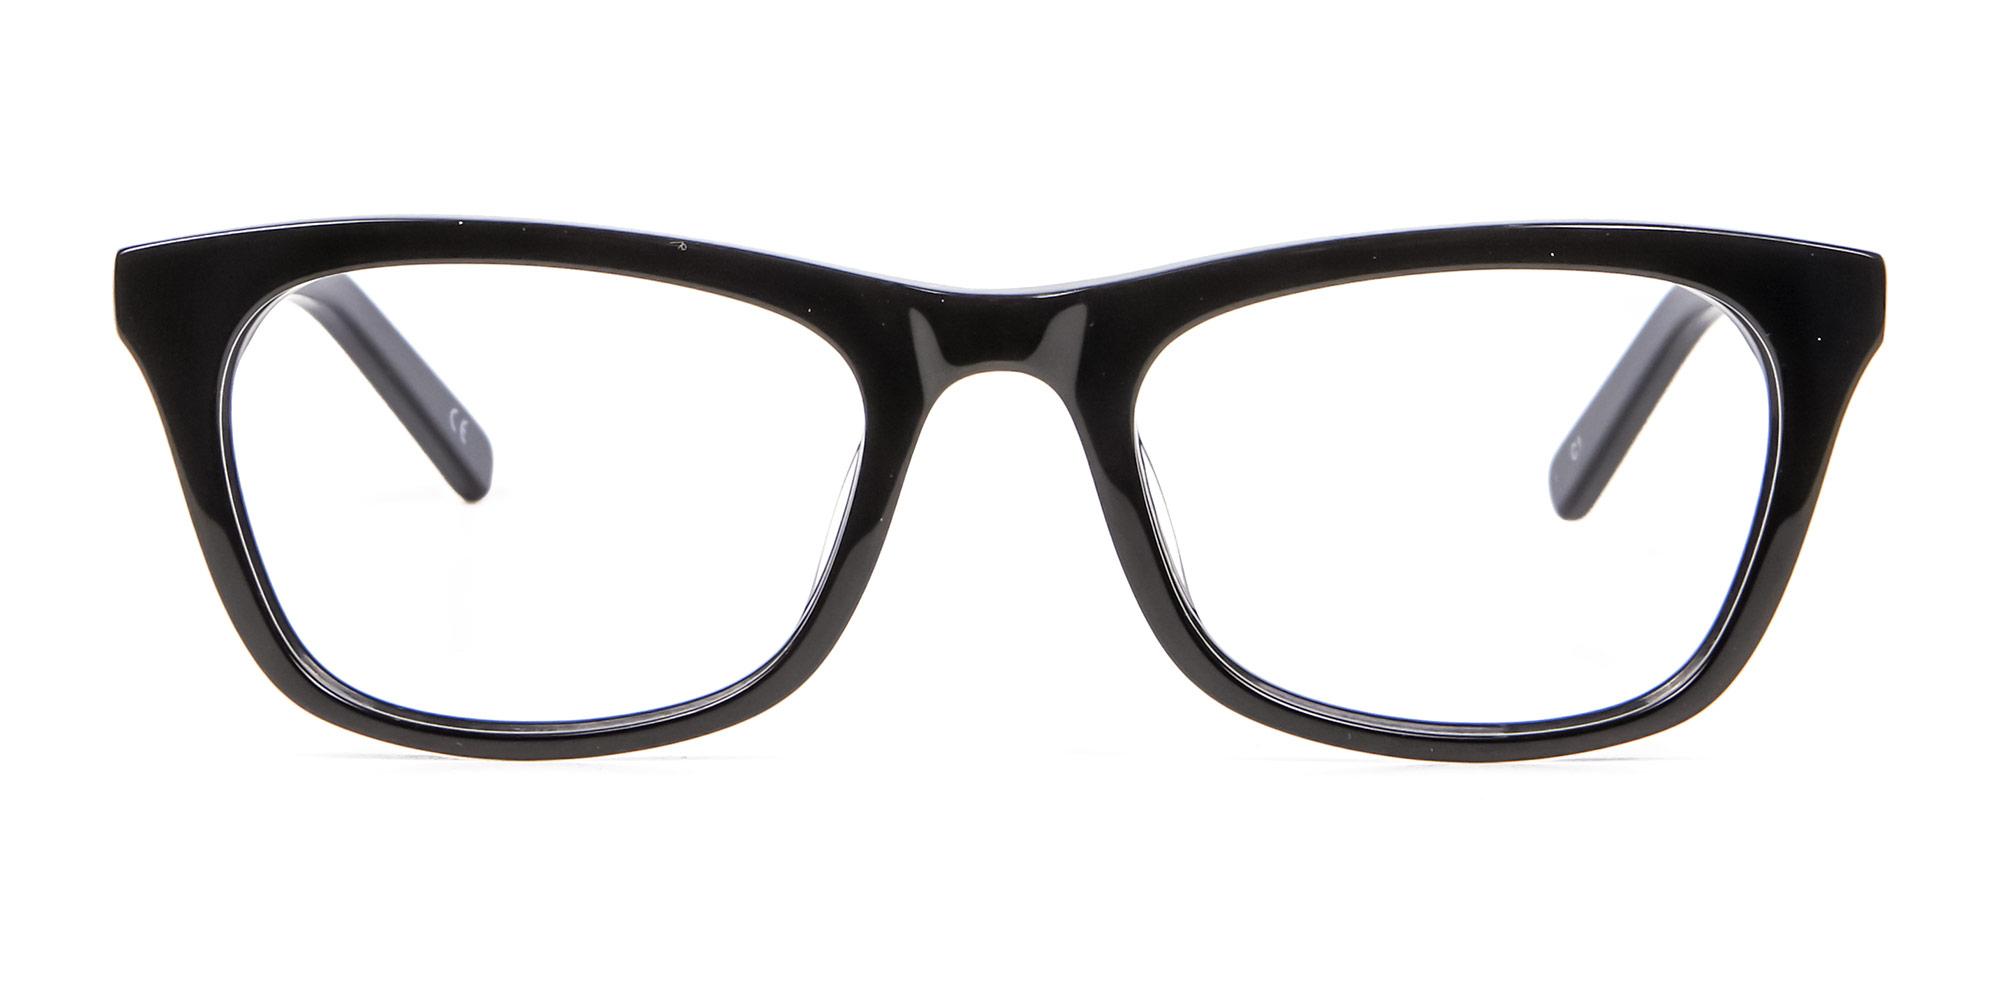 Glossy Black Glasses Frame in Cat-Eye and Wayfarer